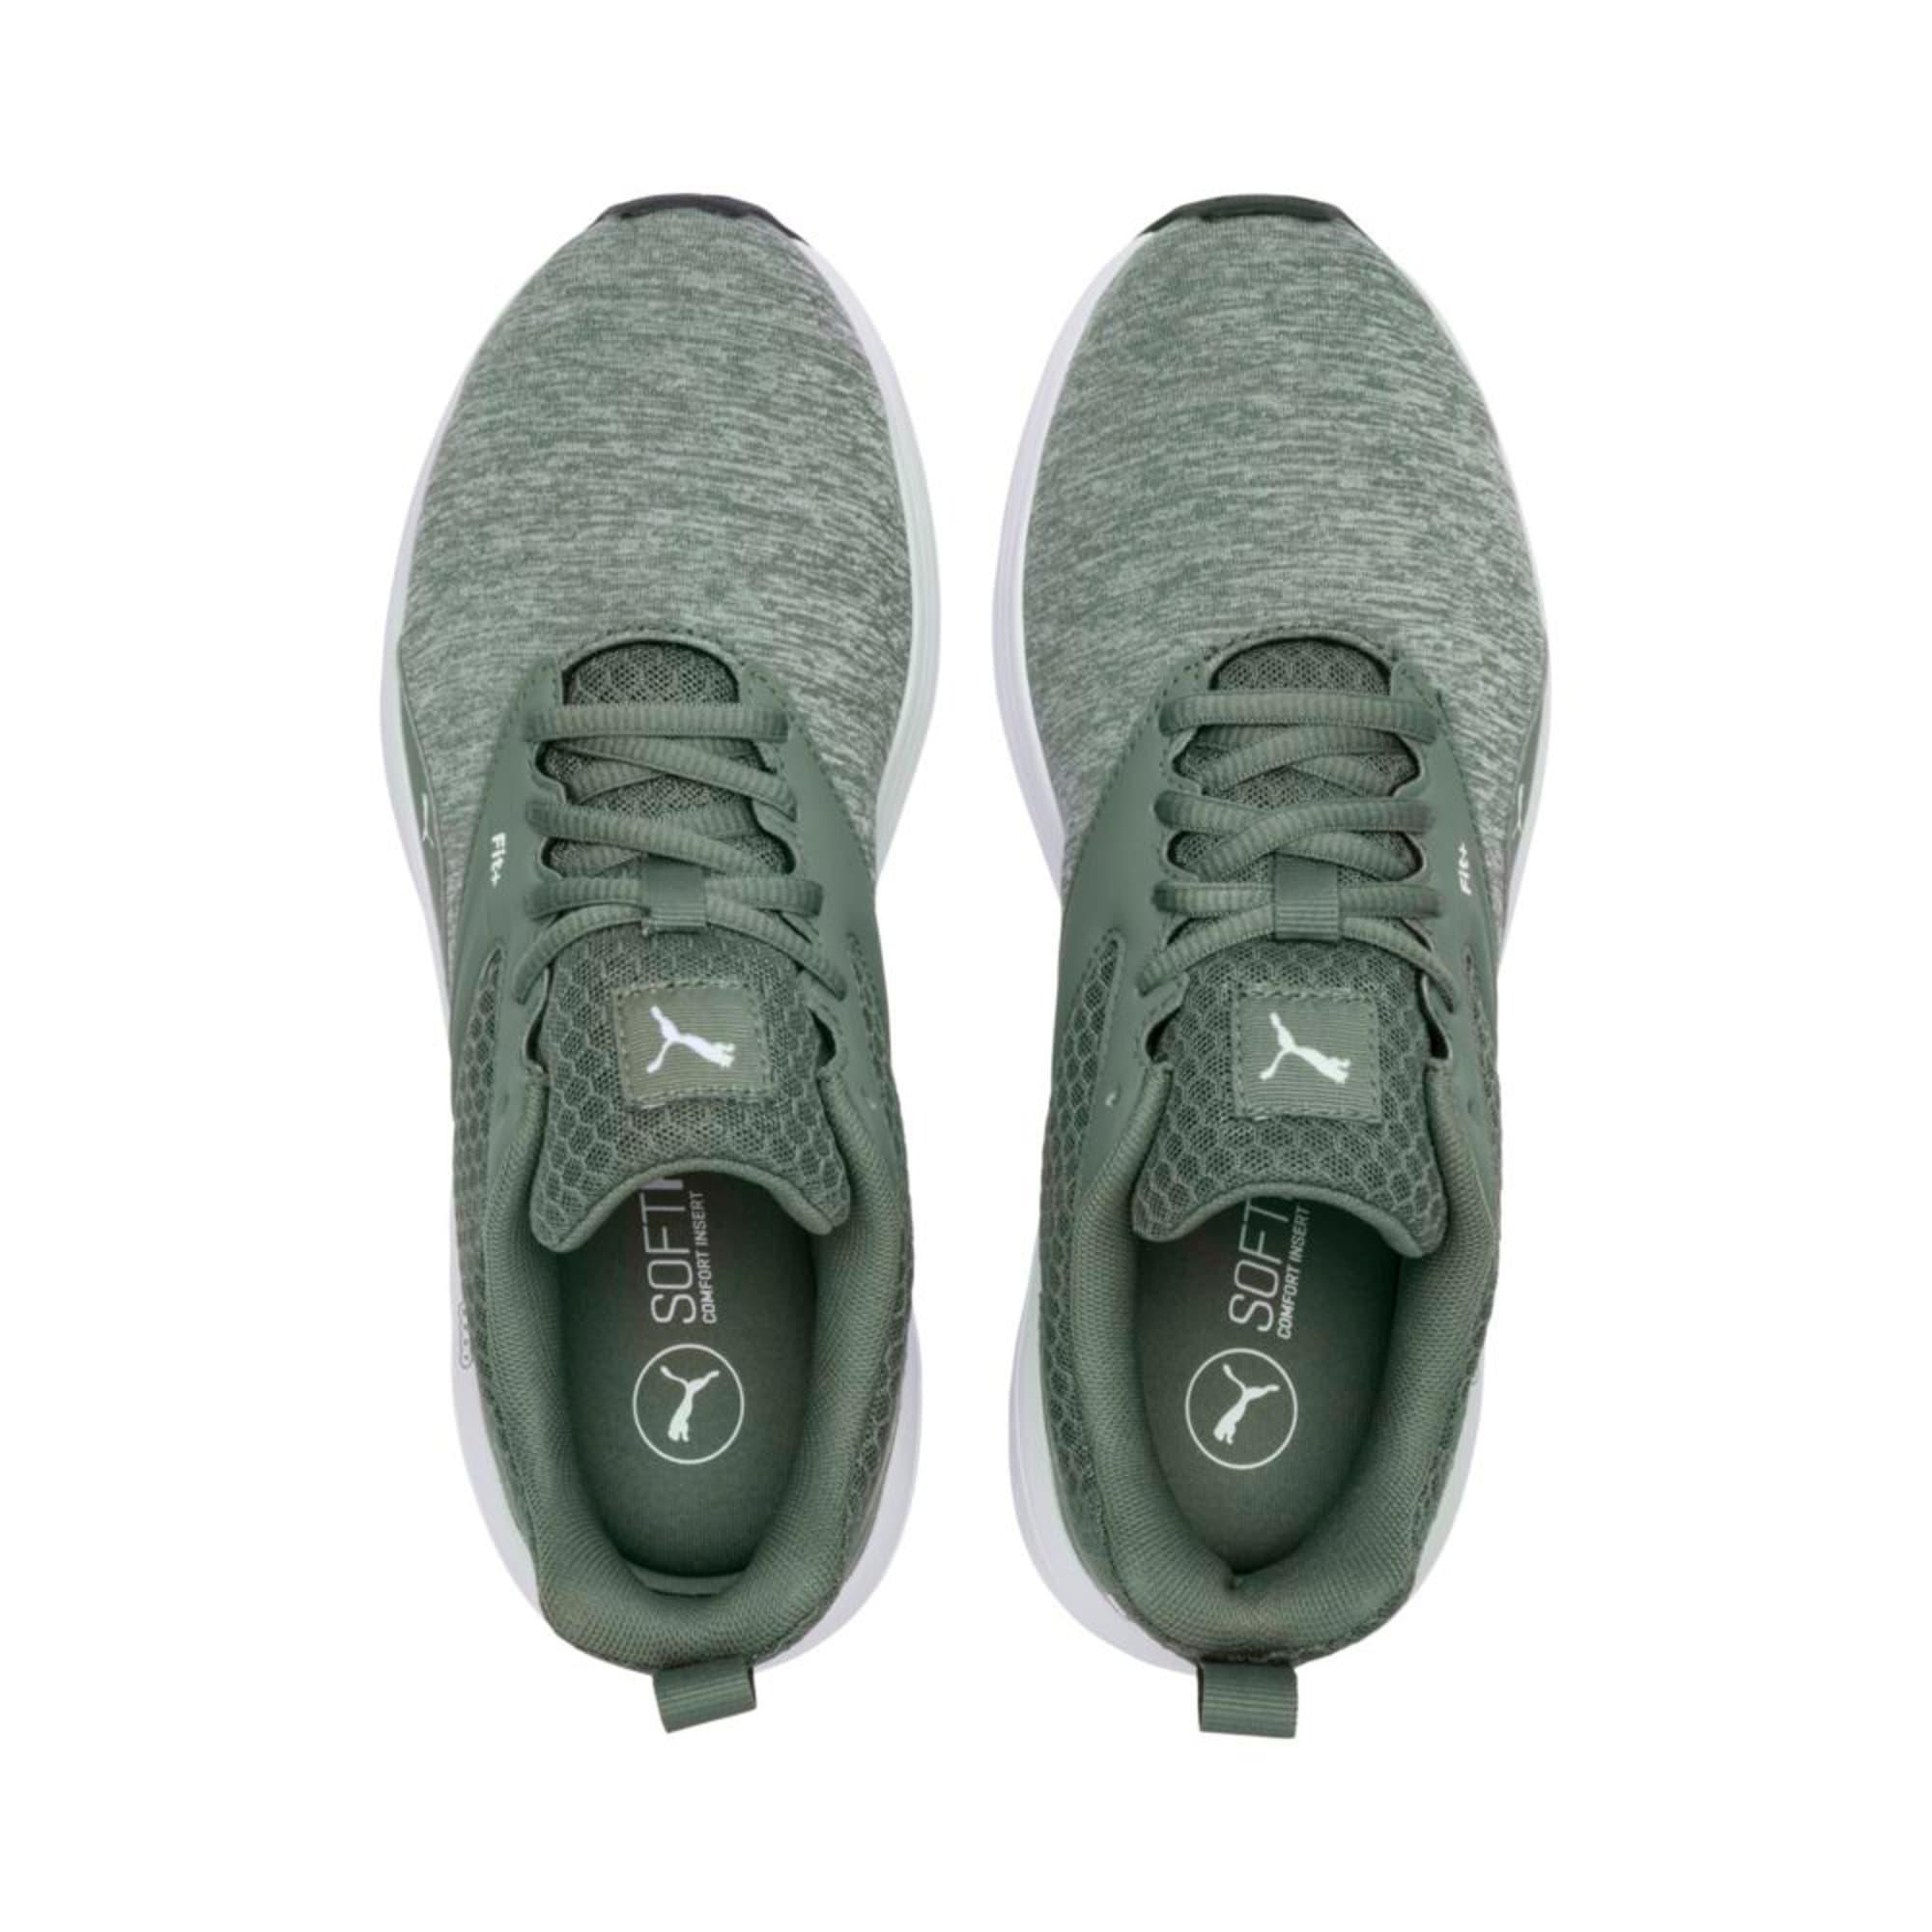 Thumbnail 3 of NRGY Comet Running Shoes, Laurel Wreath-Puma White, medium-IND